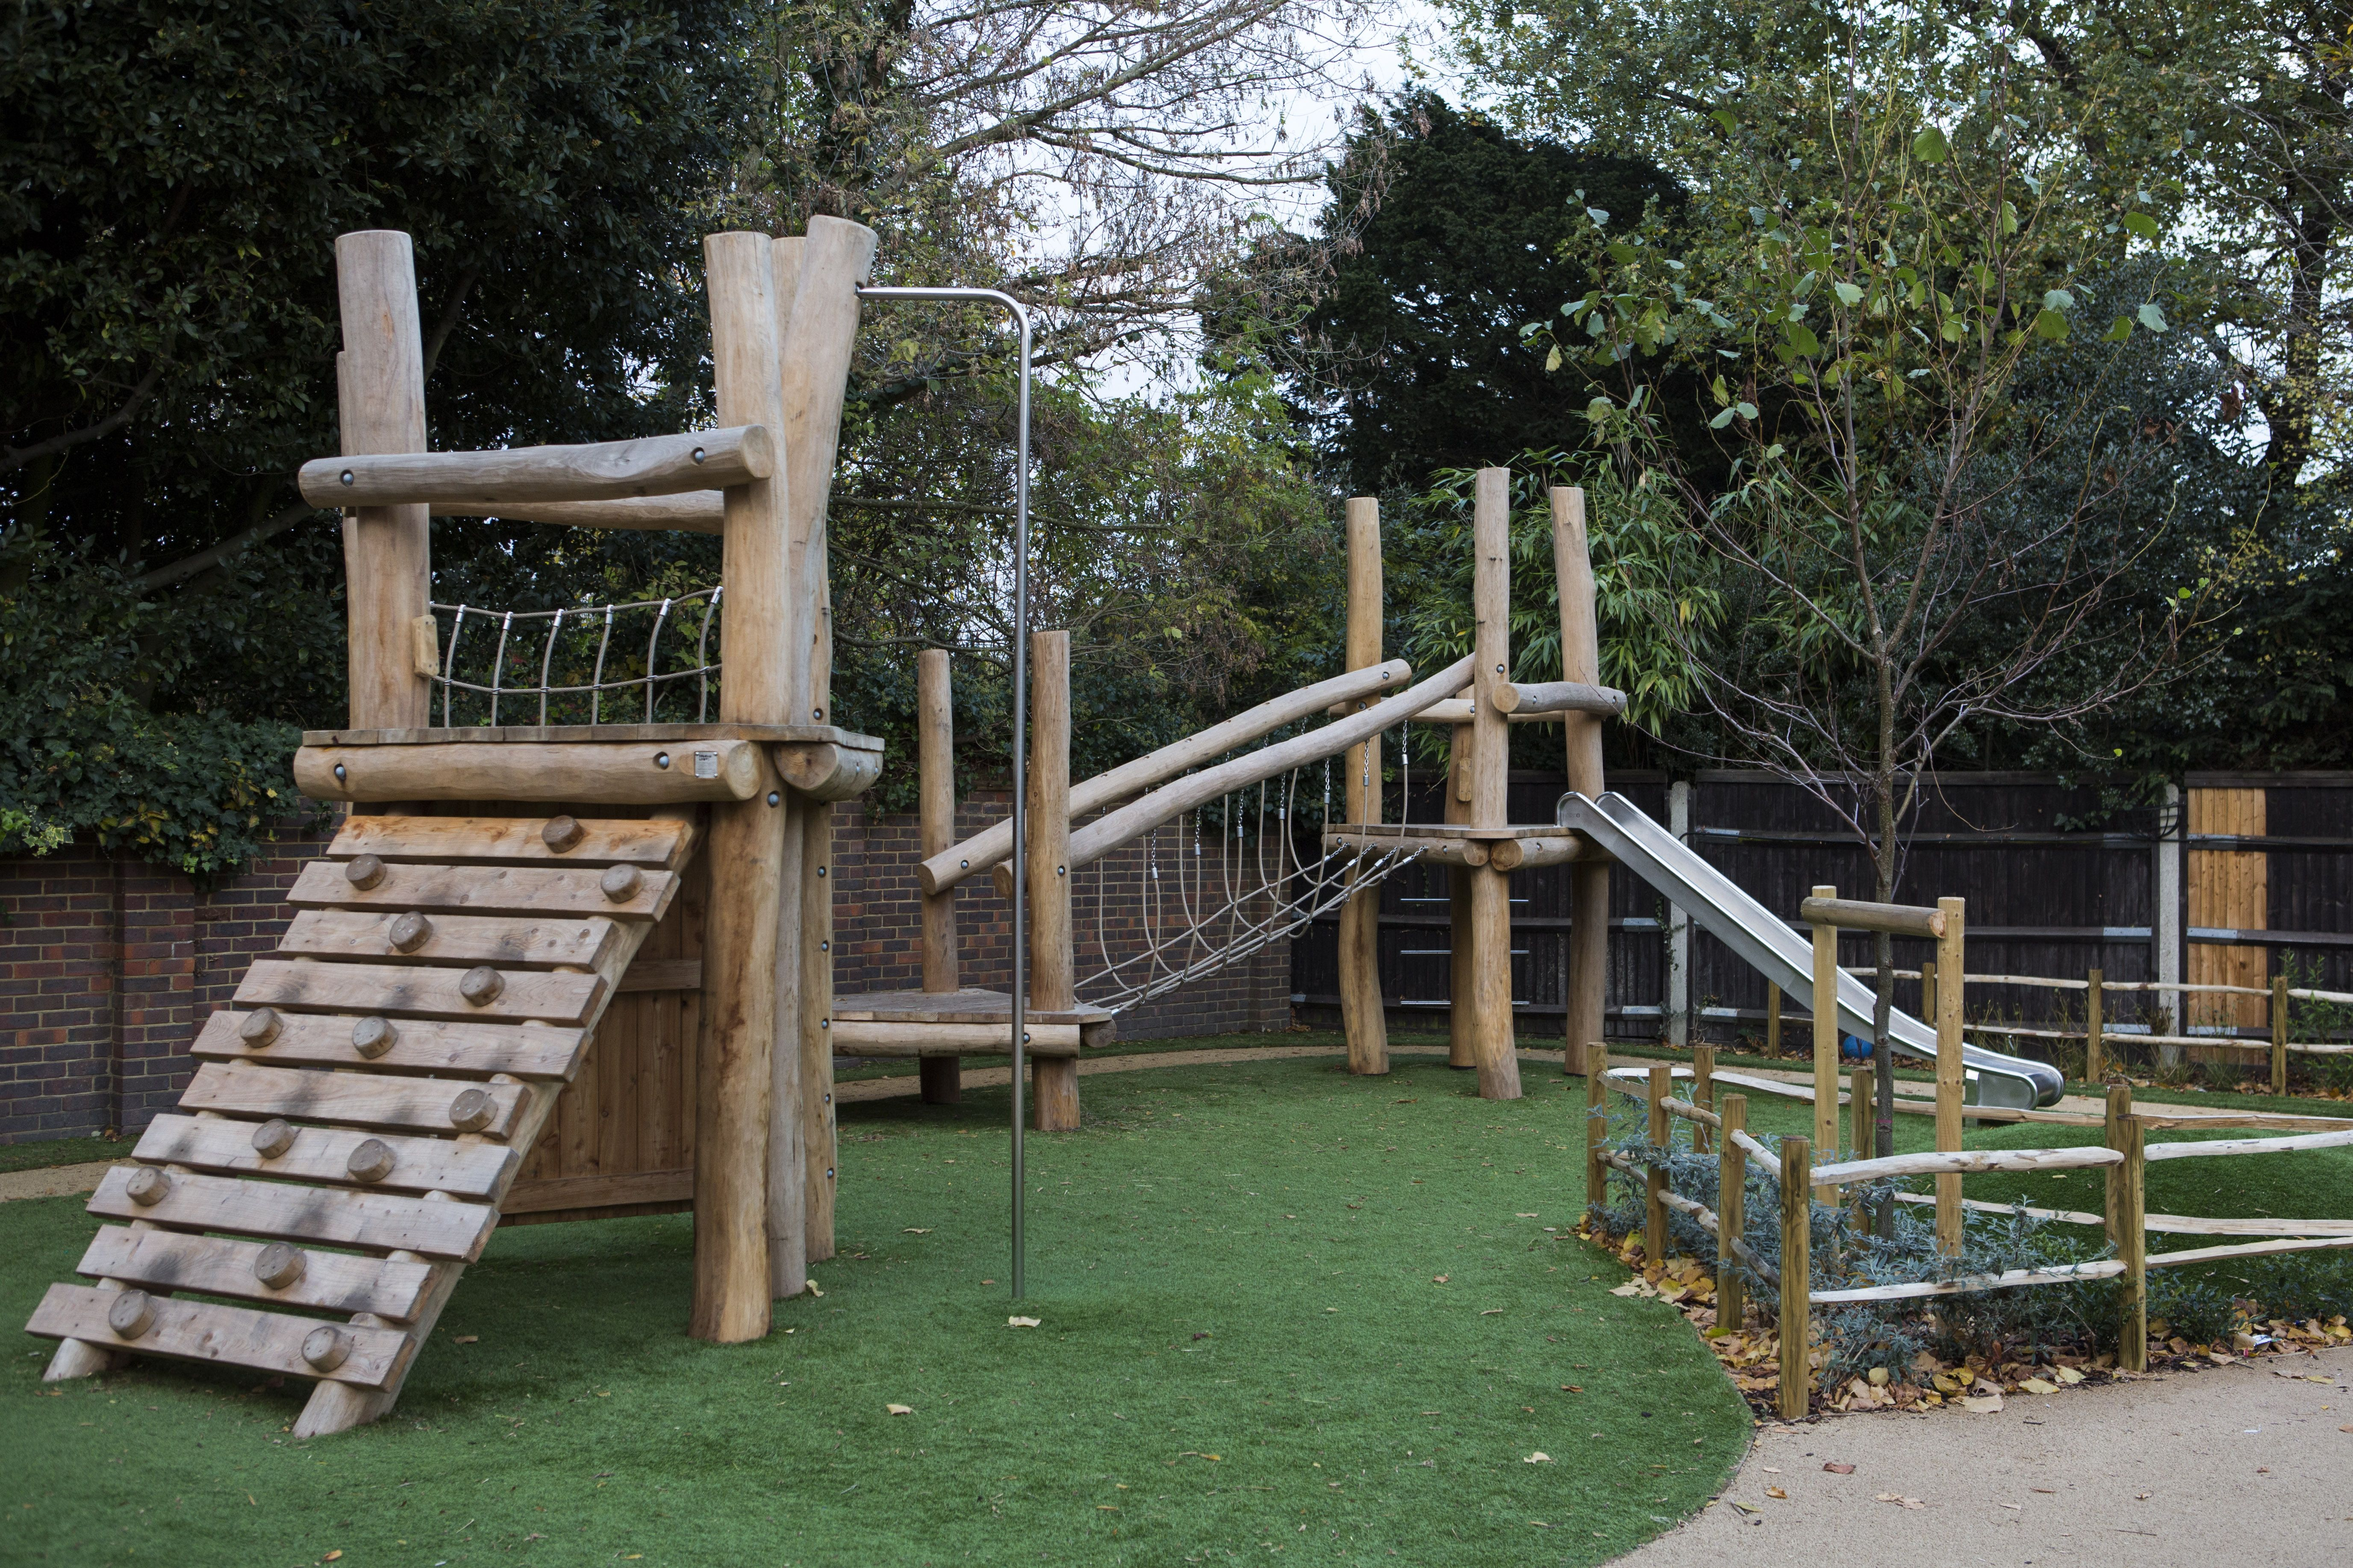 Bespoke Childrens Playground | Robinia Climbing Frame | Pinterest ...